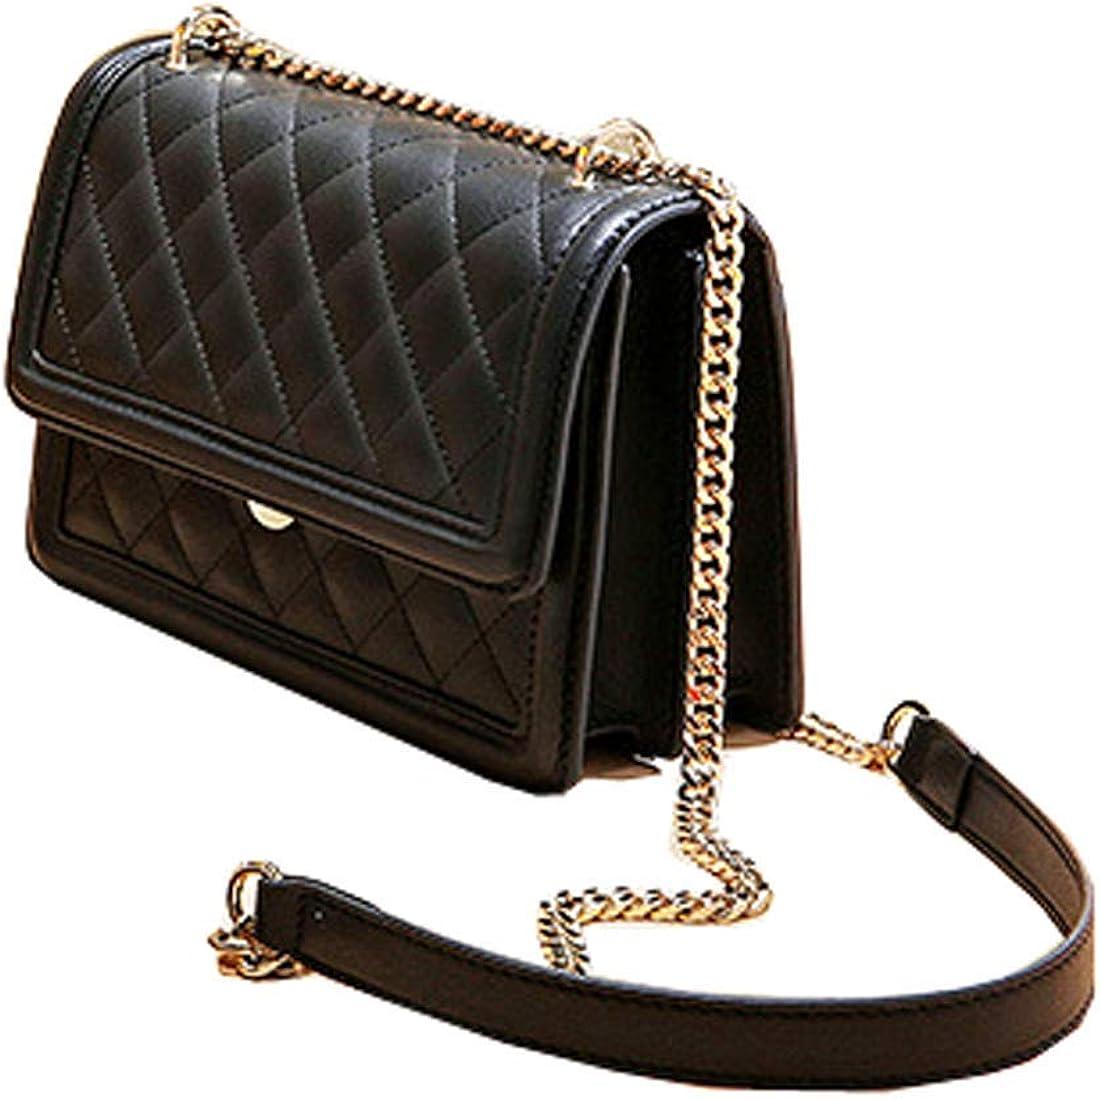 Genuine Leather Classic Satchel Long Strap Top Handle Turn Lock Closure